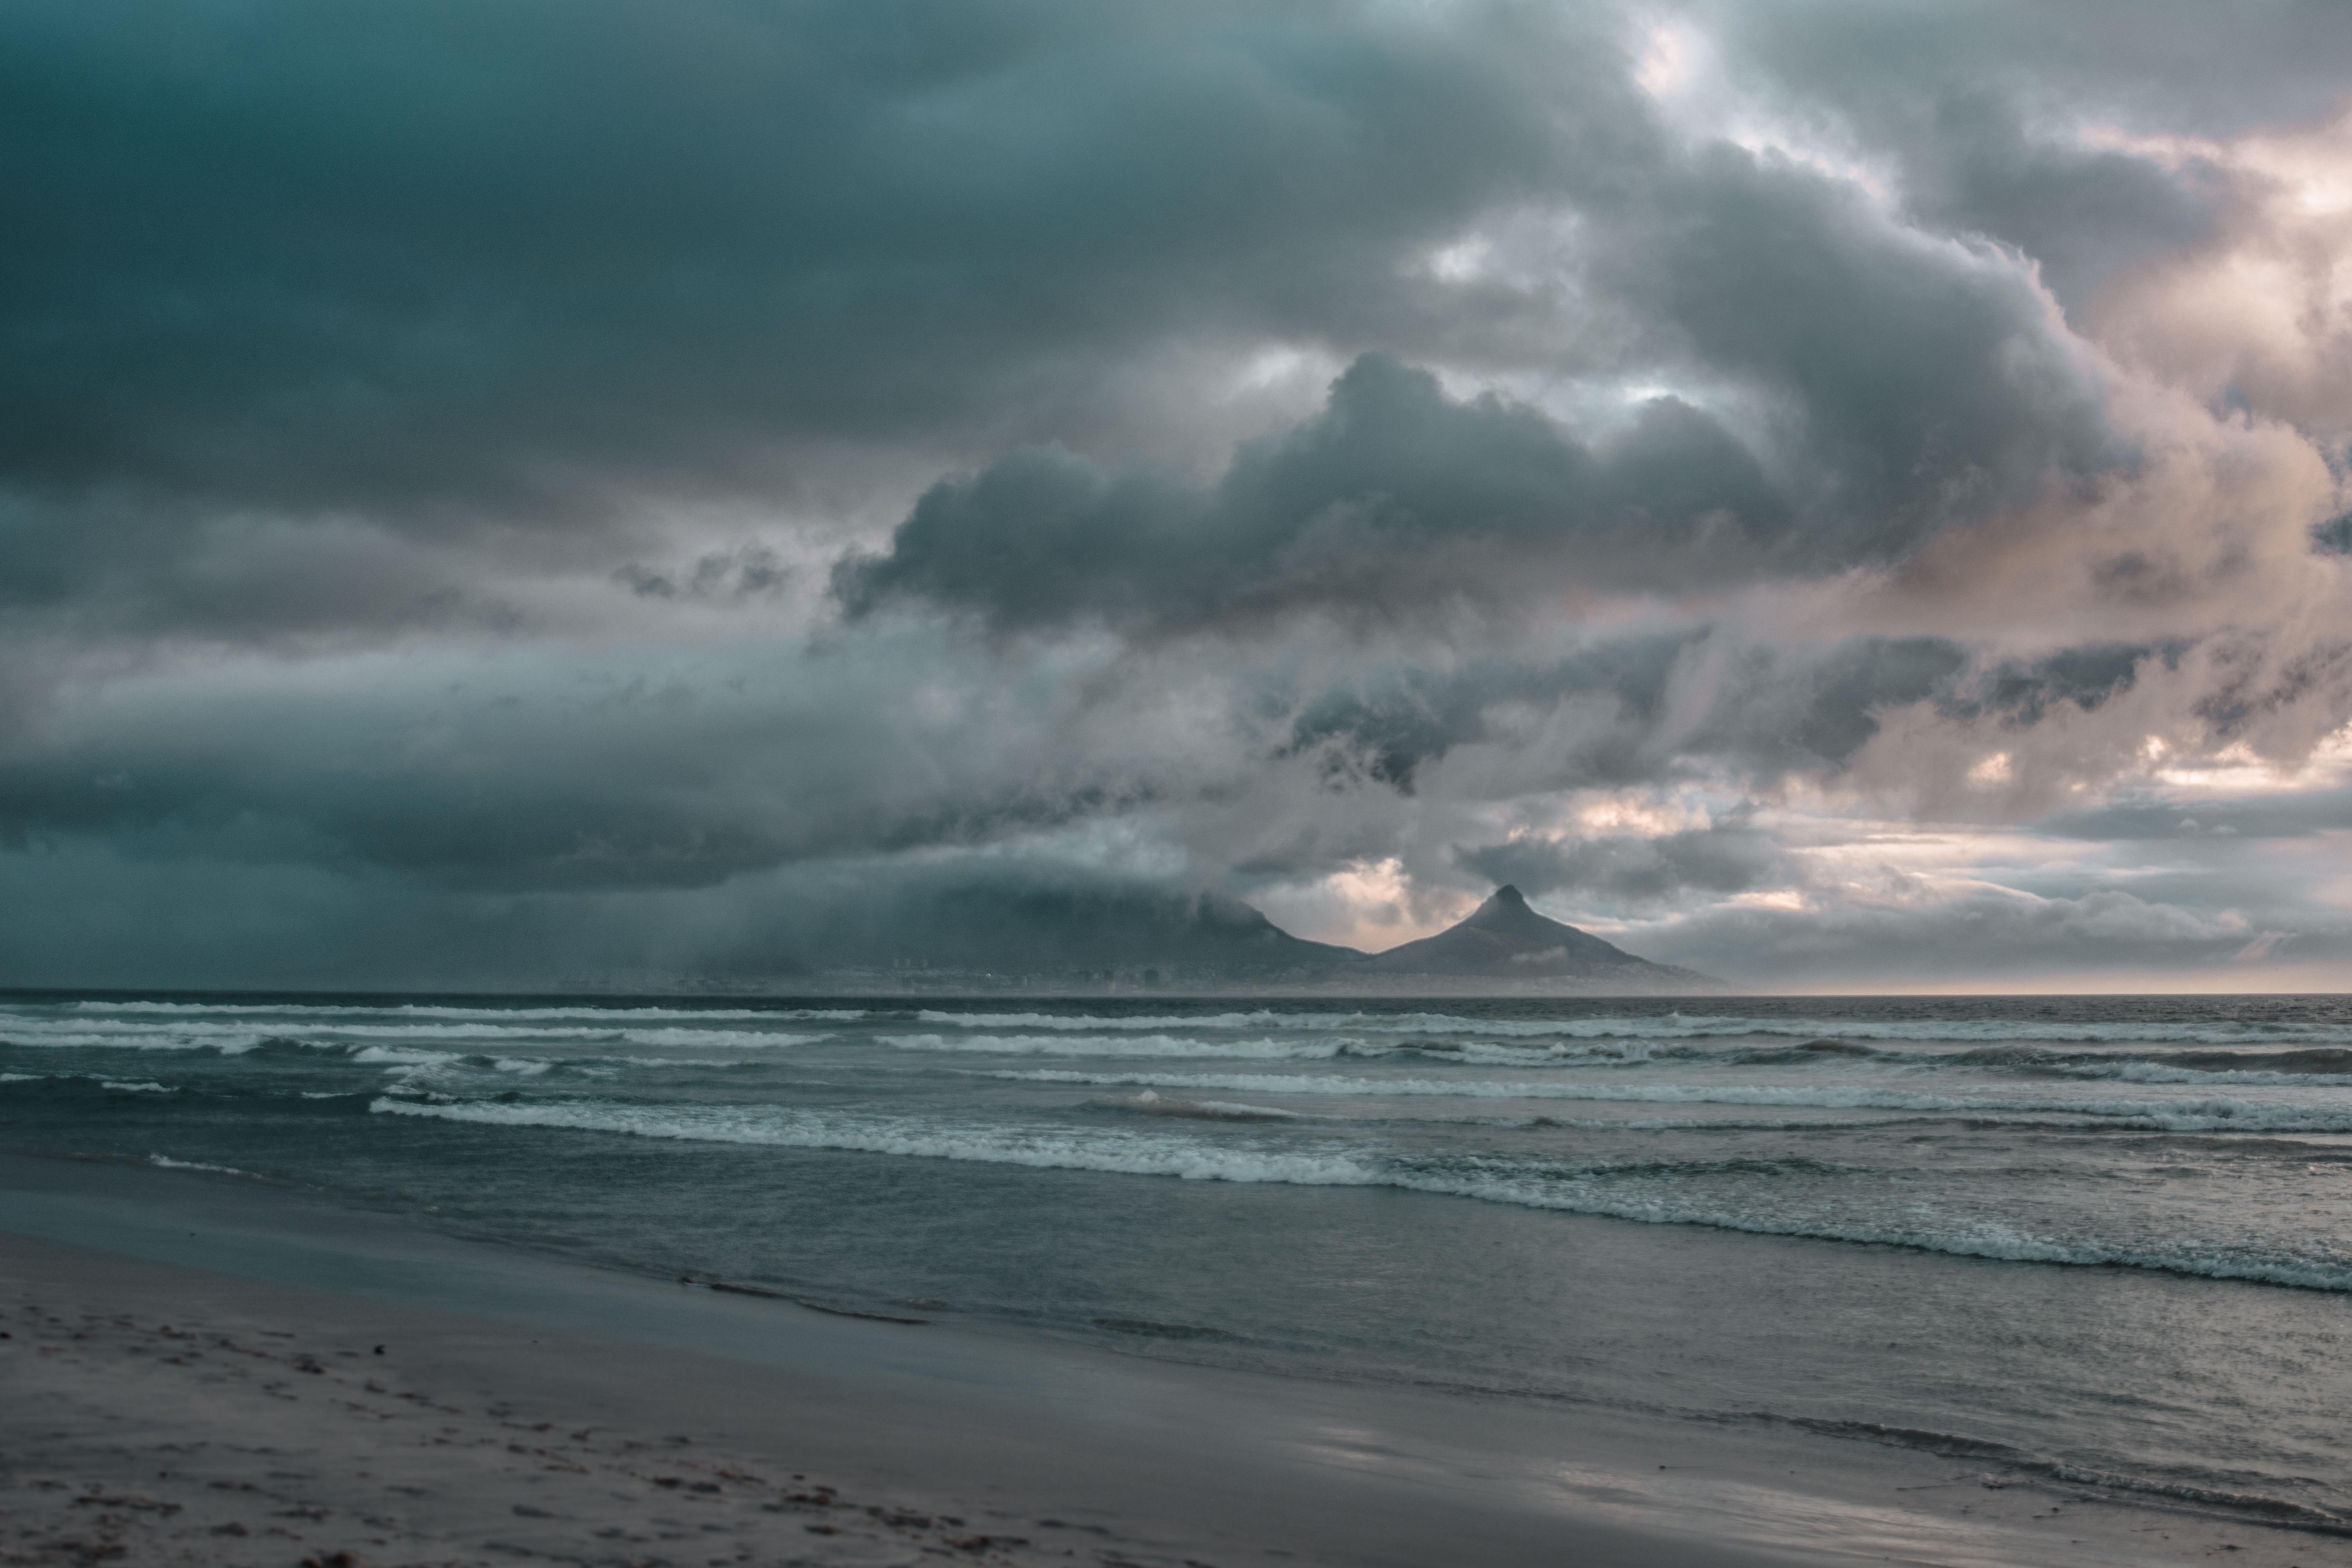 seashore across dark clouds